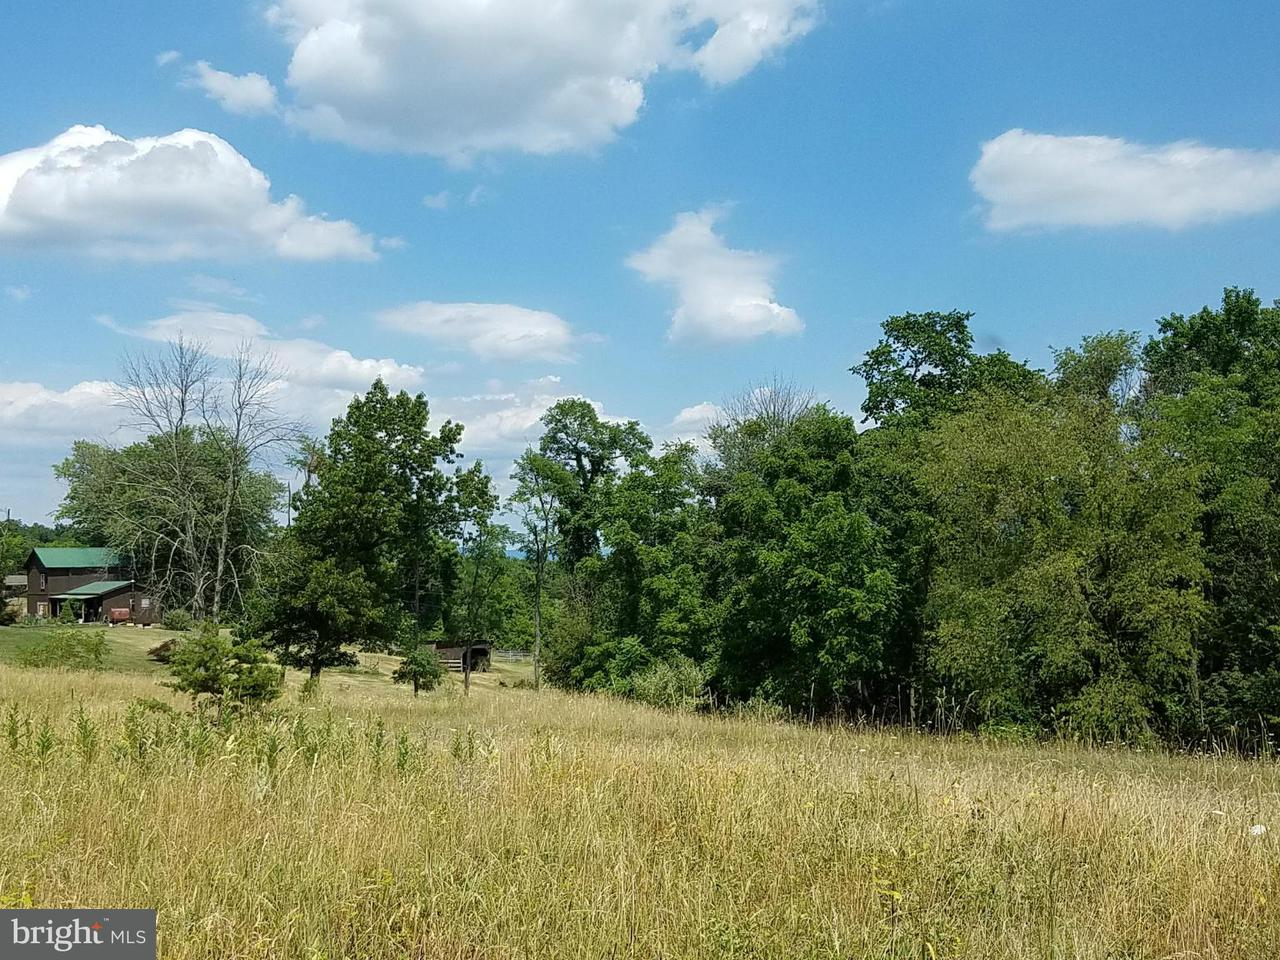 Land for Sale at 5 Husk Trl Berkeley Springs, West Virginia 25411 United States